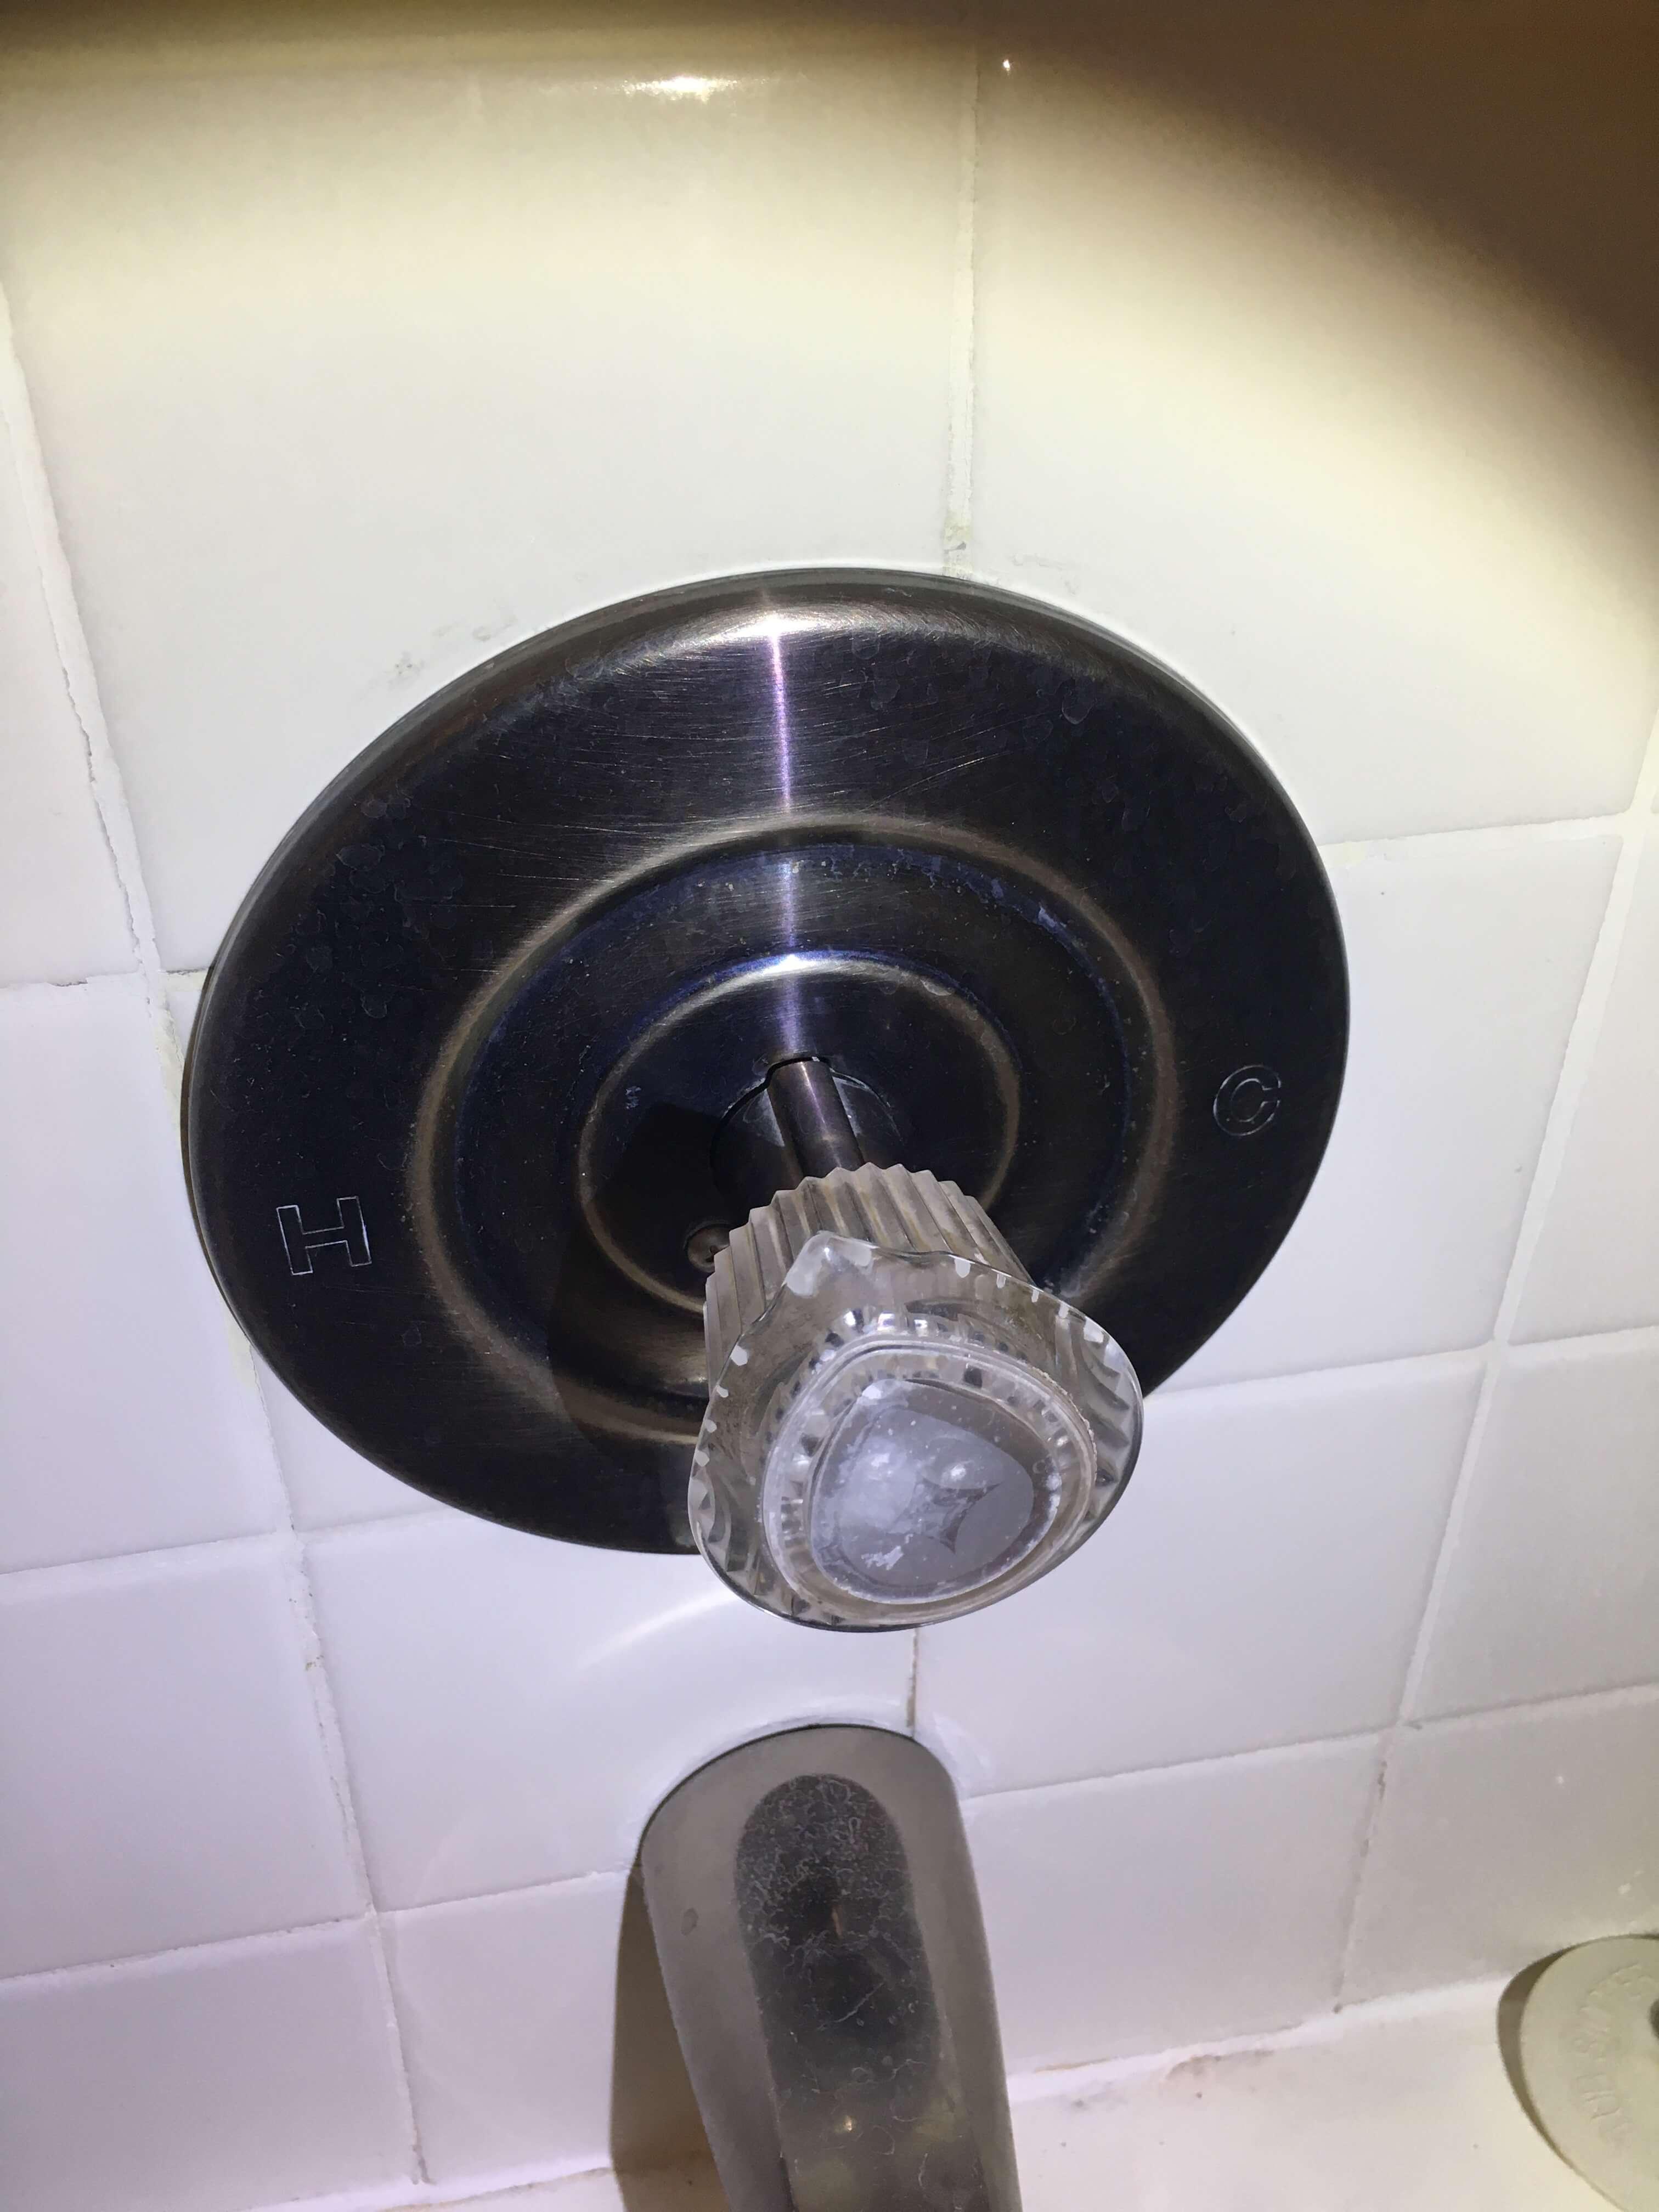 Plumbing Leak In Wall Behind Pushpull Bathtub Faucet